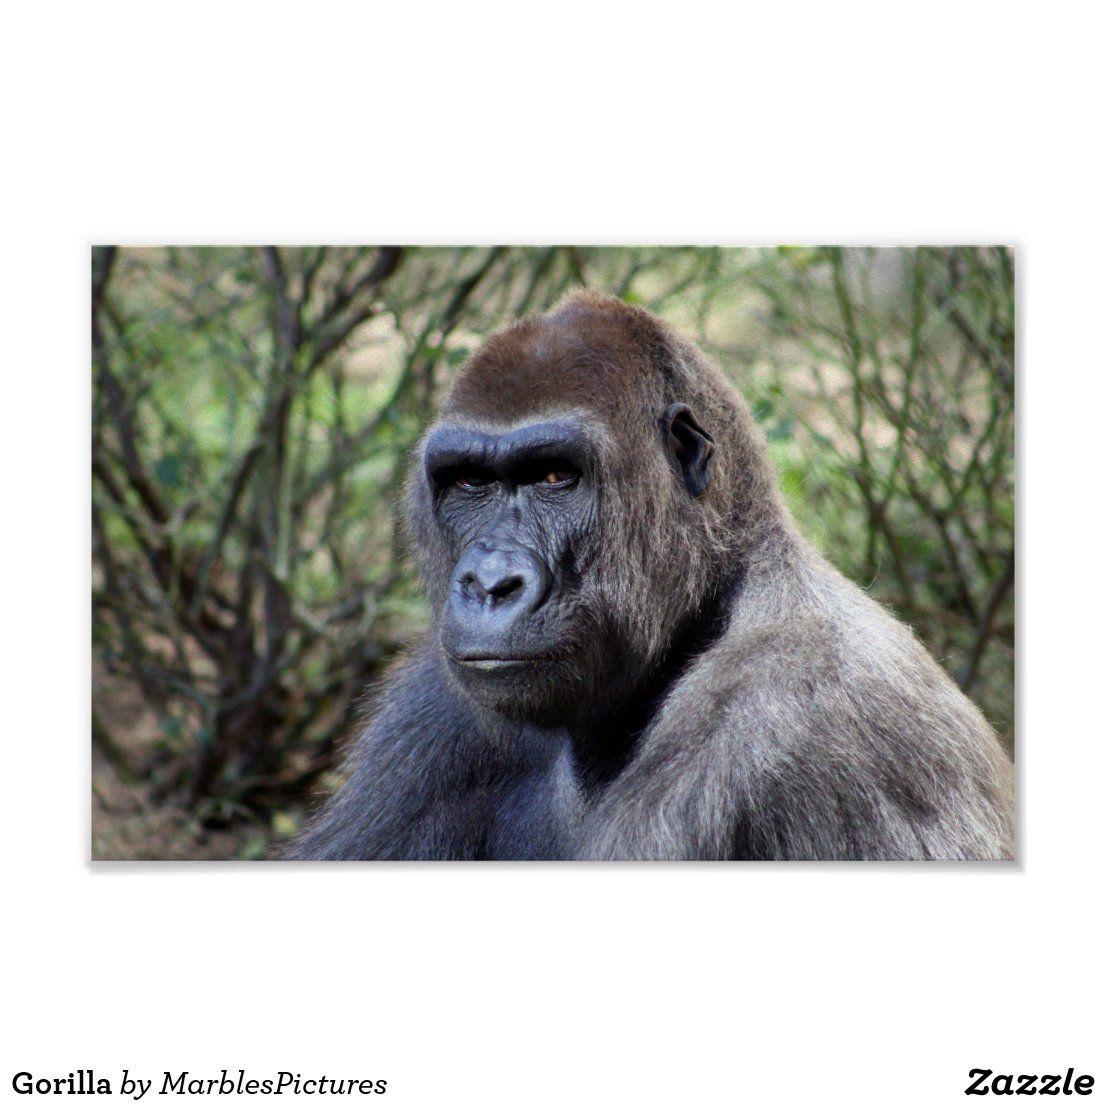 Gorilla Poster | Zazzle.com (With images) | Animal classification, Gorilla,  Primates